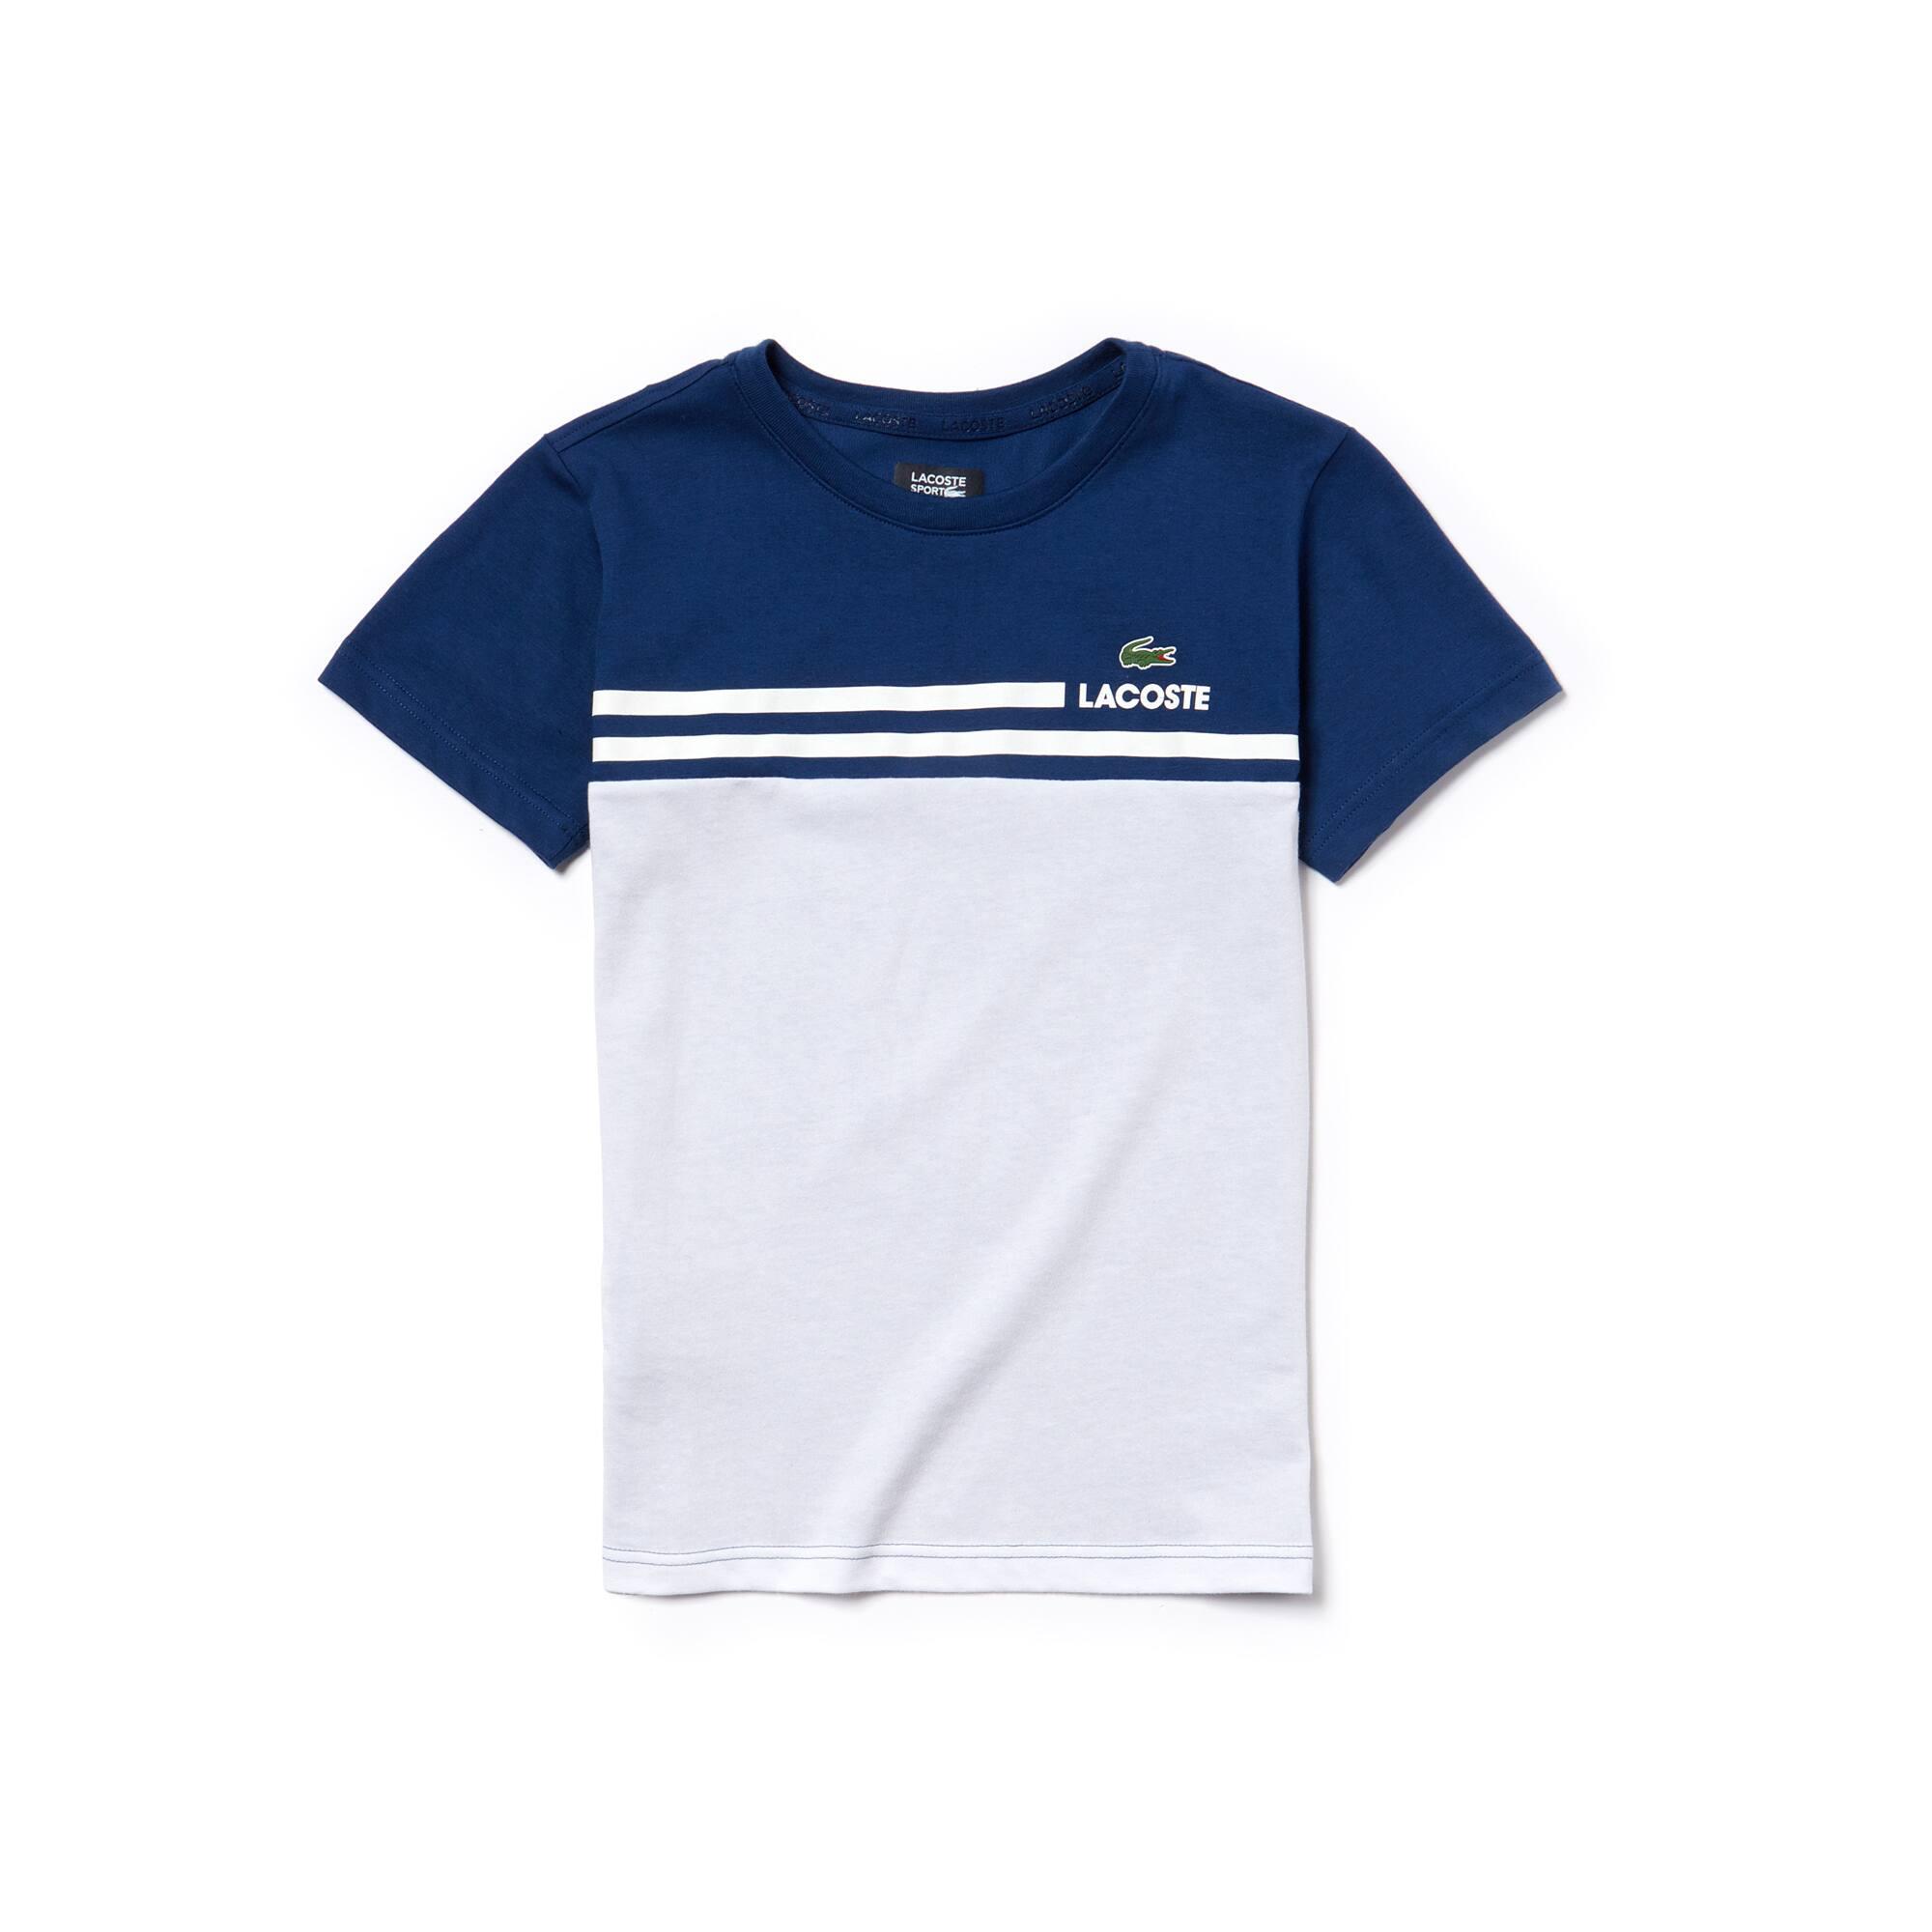 Jungen LACOSTE SPORT Tennis T-Shirt mit Colorblocks